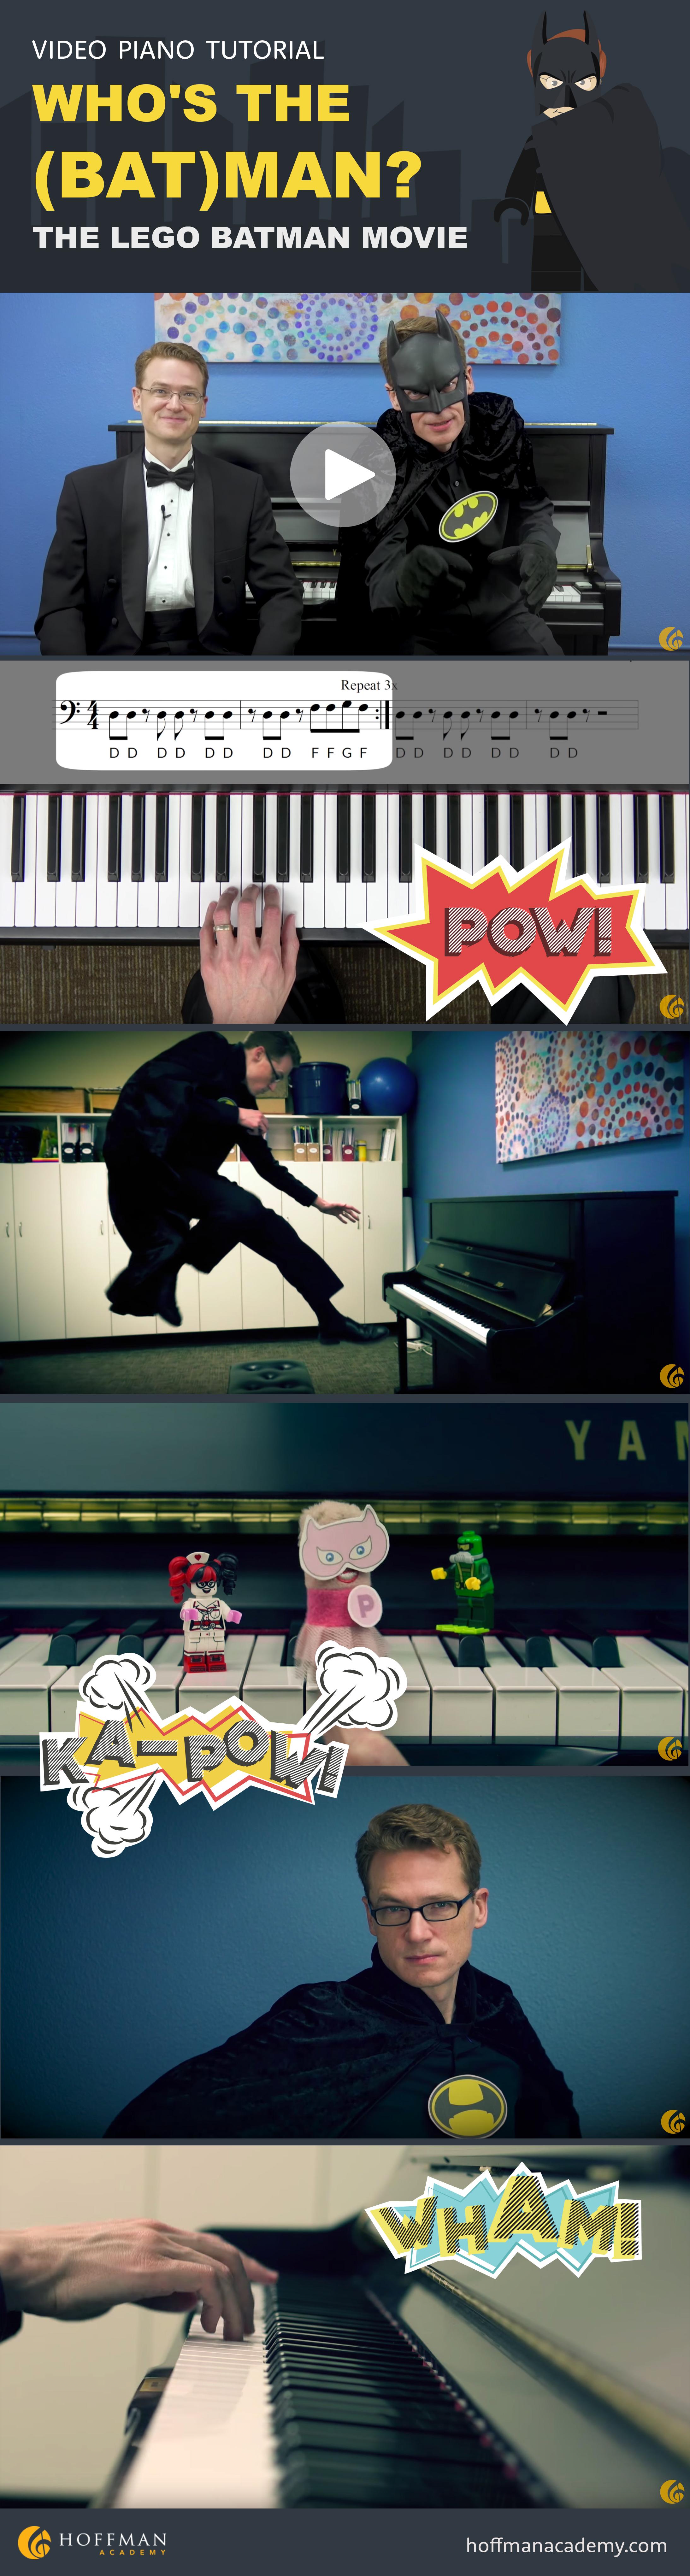 Piano Tutorial Video